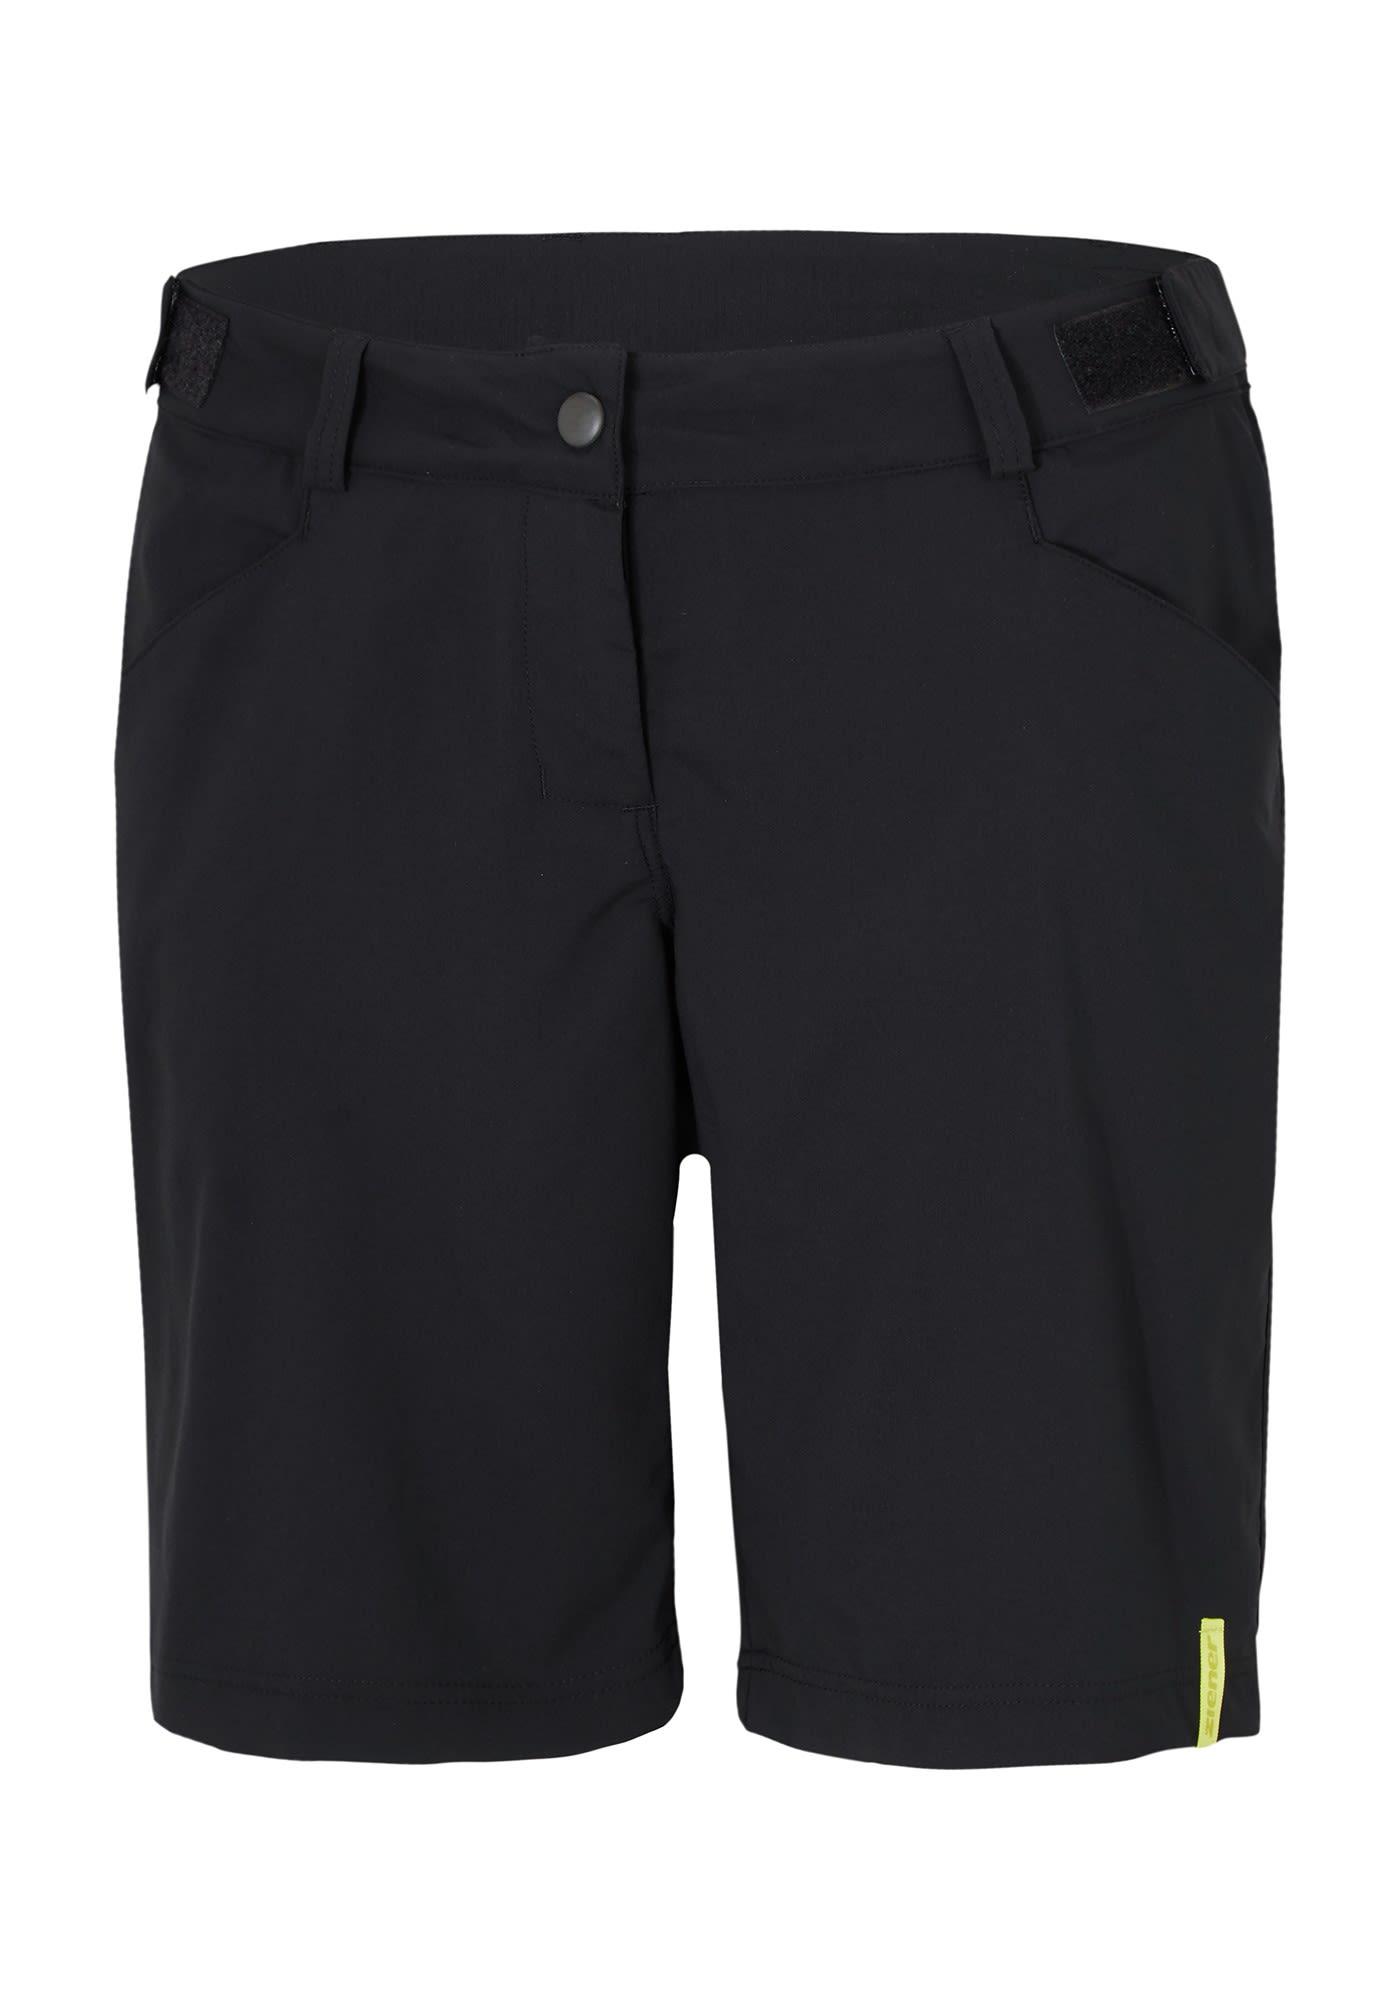 Ziener Colodri X-Function Schwarz, Female Shorts, 42